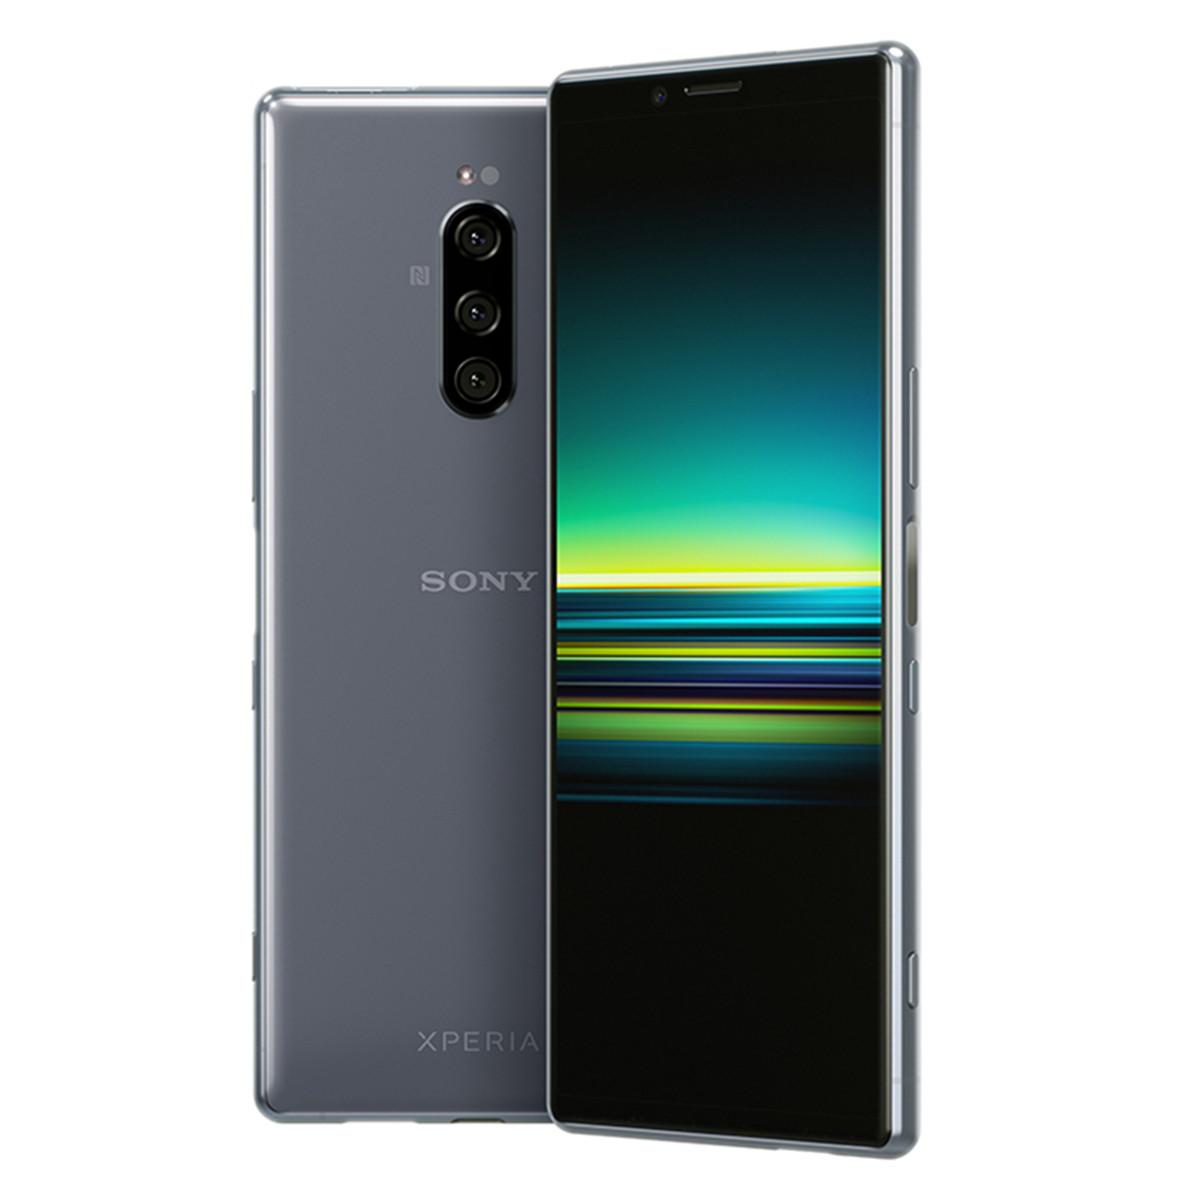 SONY索尼手机Xperia 1 4K屏幕HDR OLED全面屏三摄拍照21:9智能手机Xperia 1H